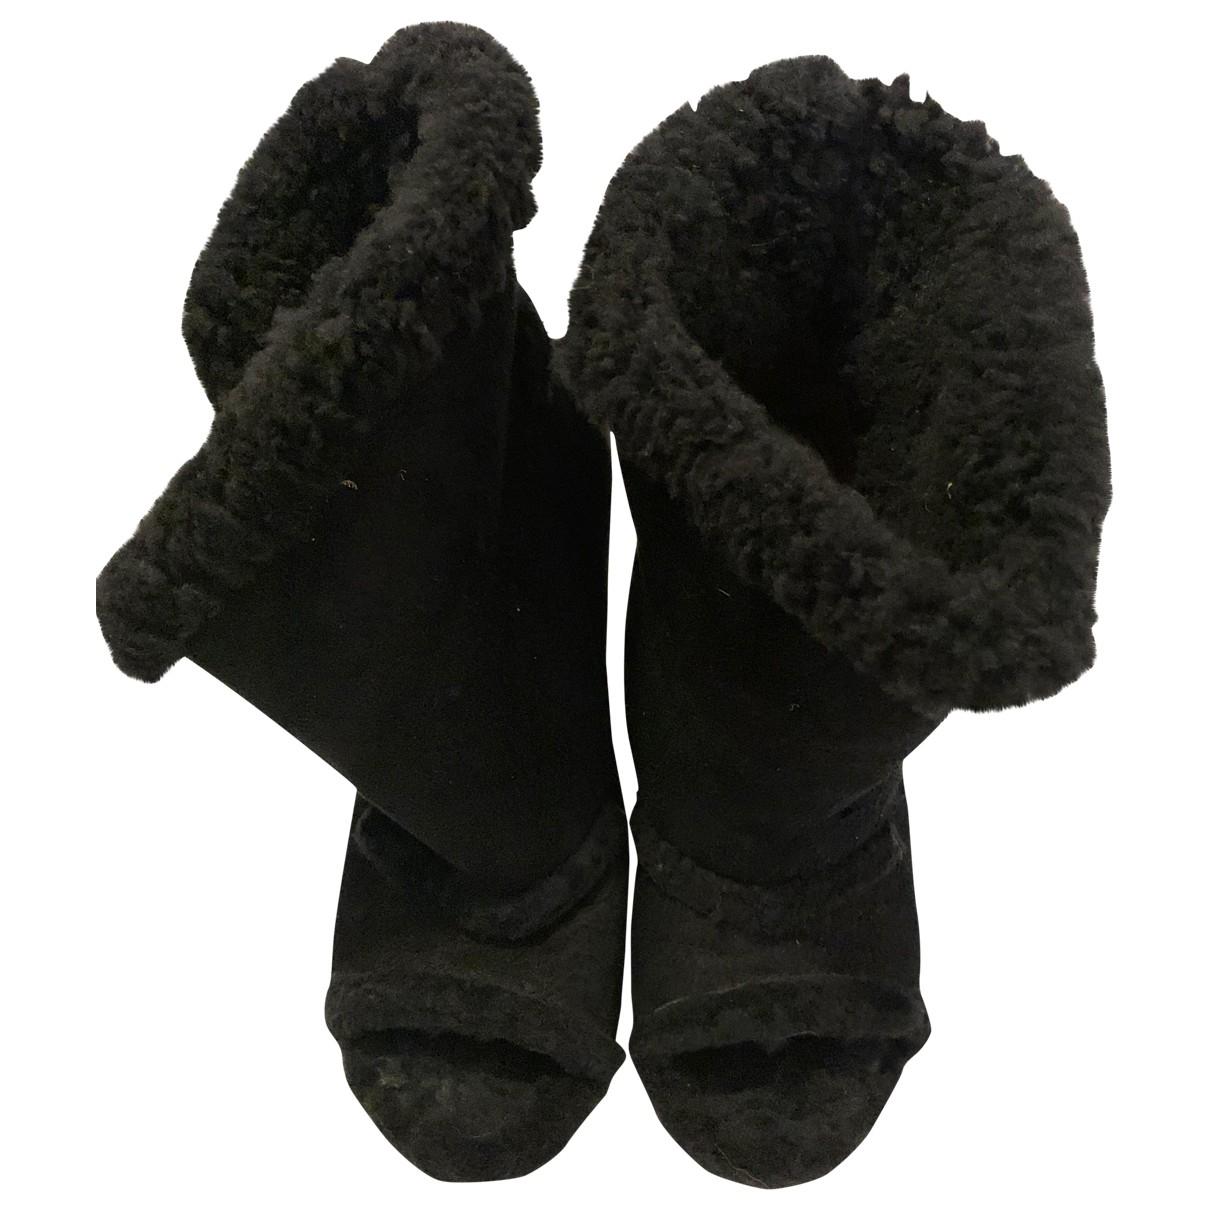 Maison Martin Margiela \N Black Suede Ankle boots for Women 38 IT